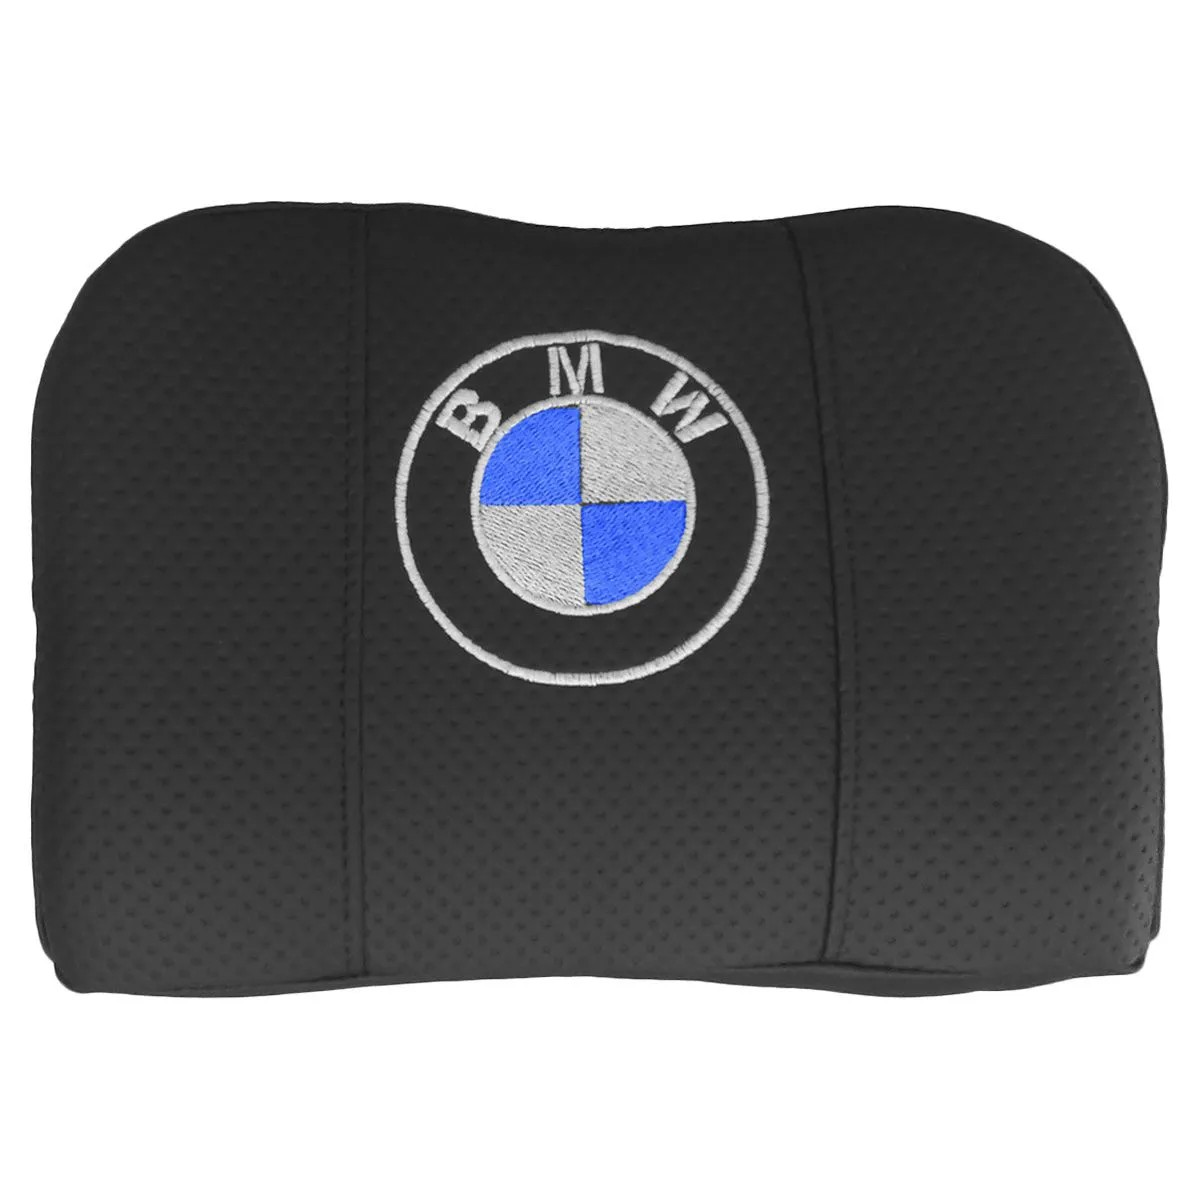 Encosto p/ Baú Top Case Universal Bráz Acessórios Modelo:BMW